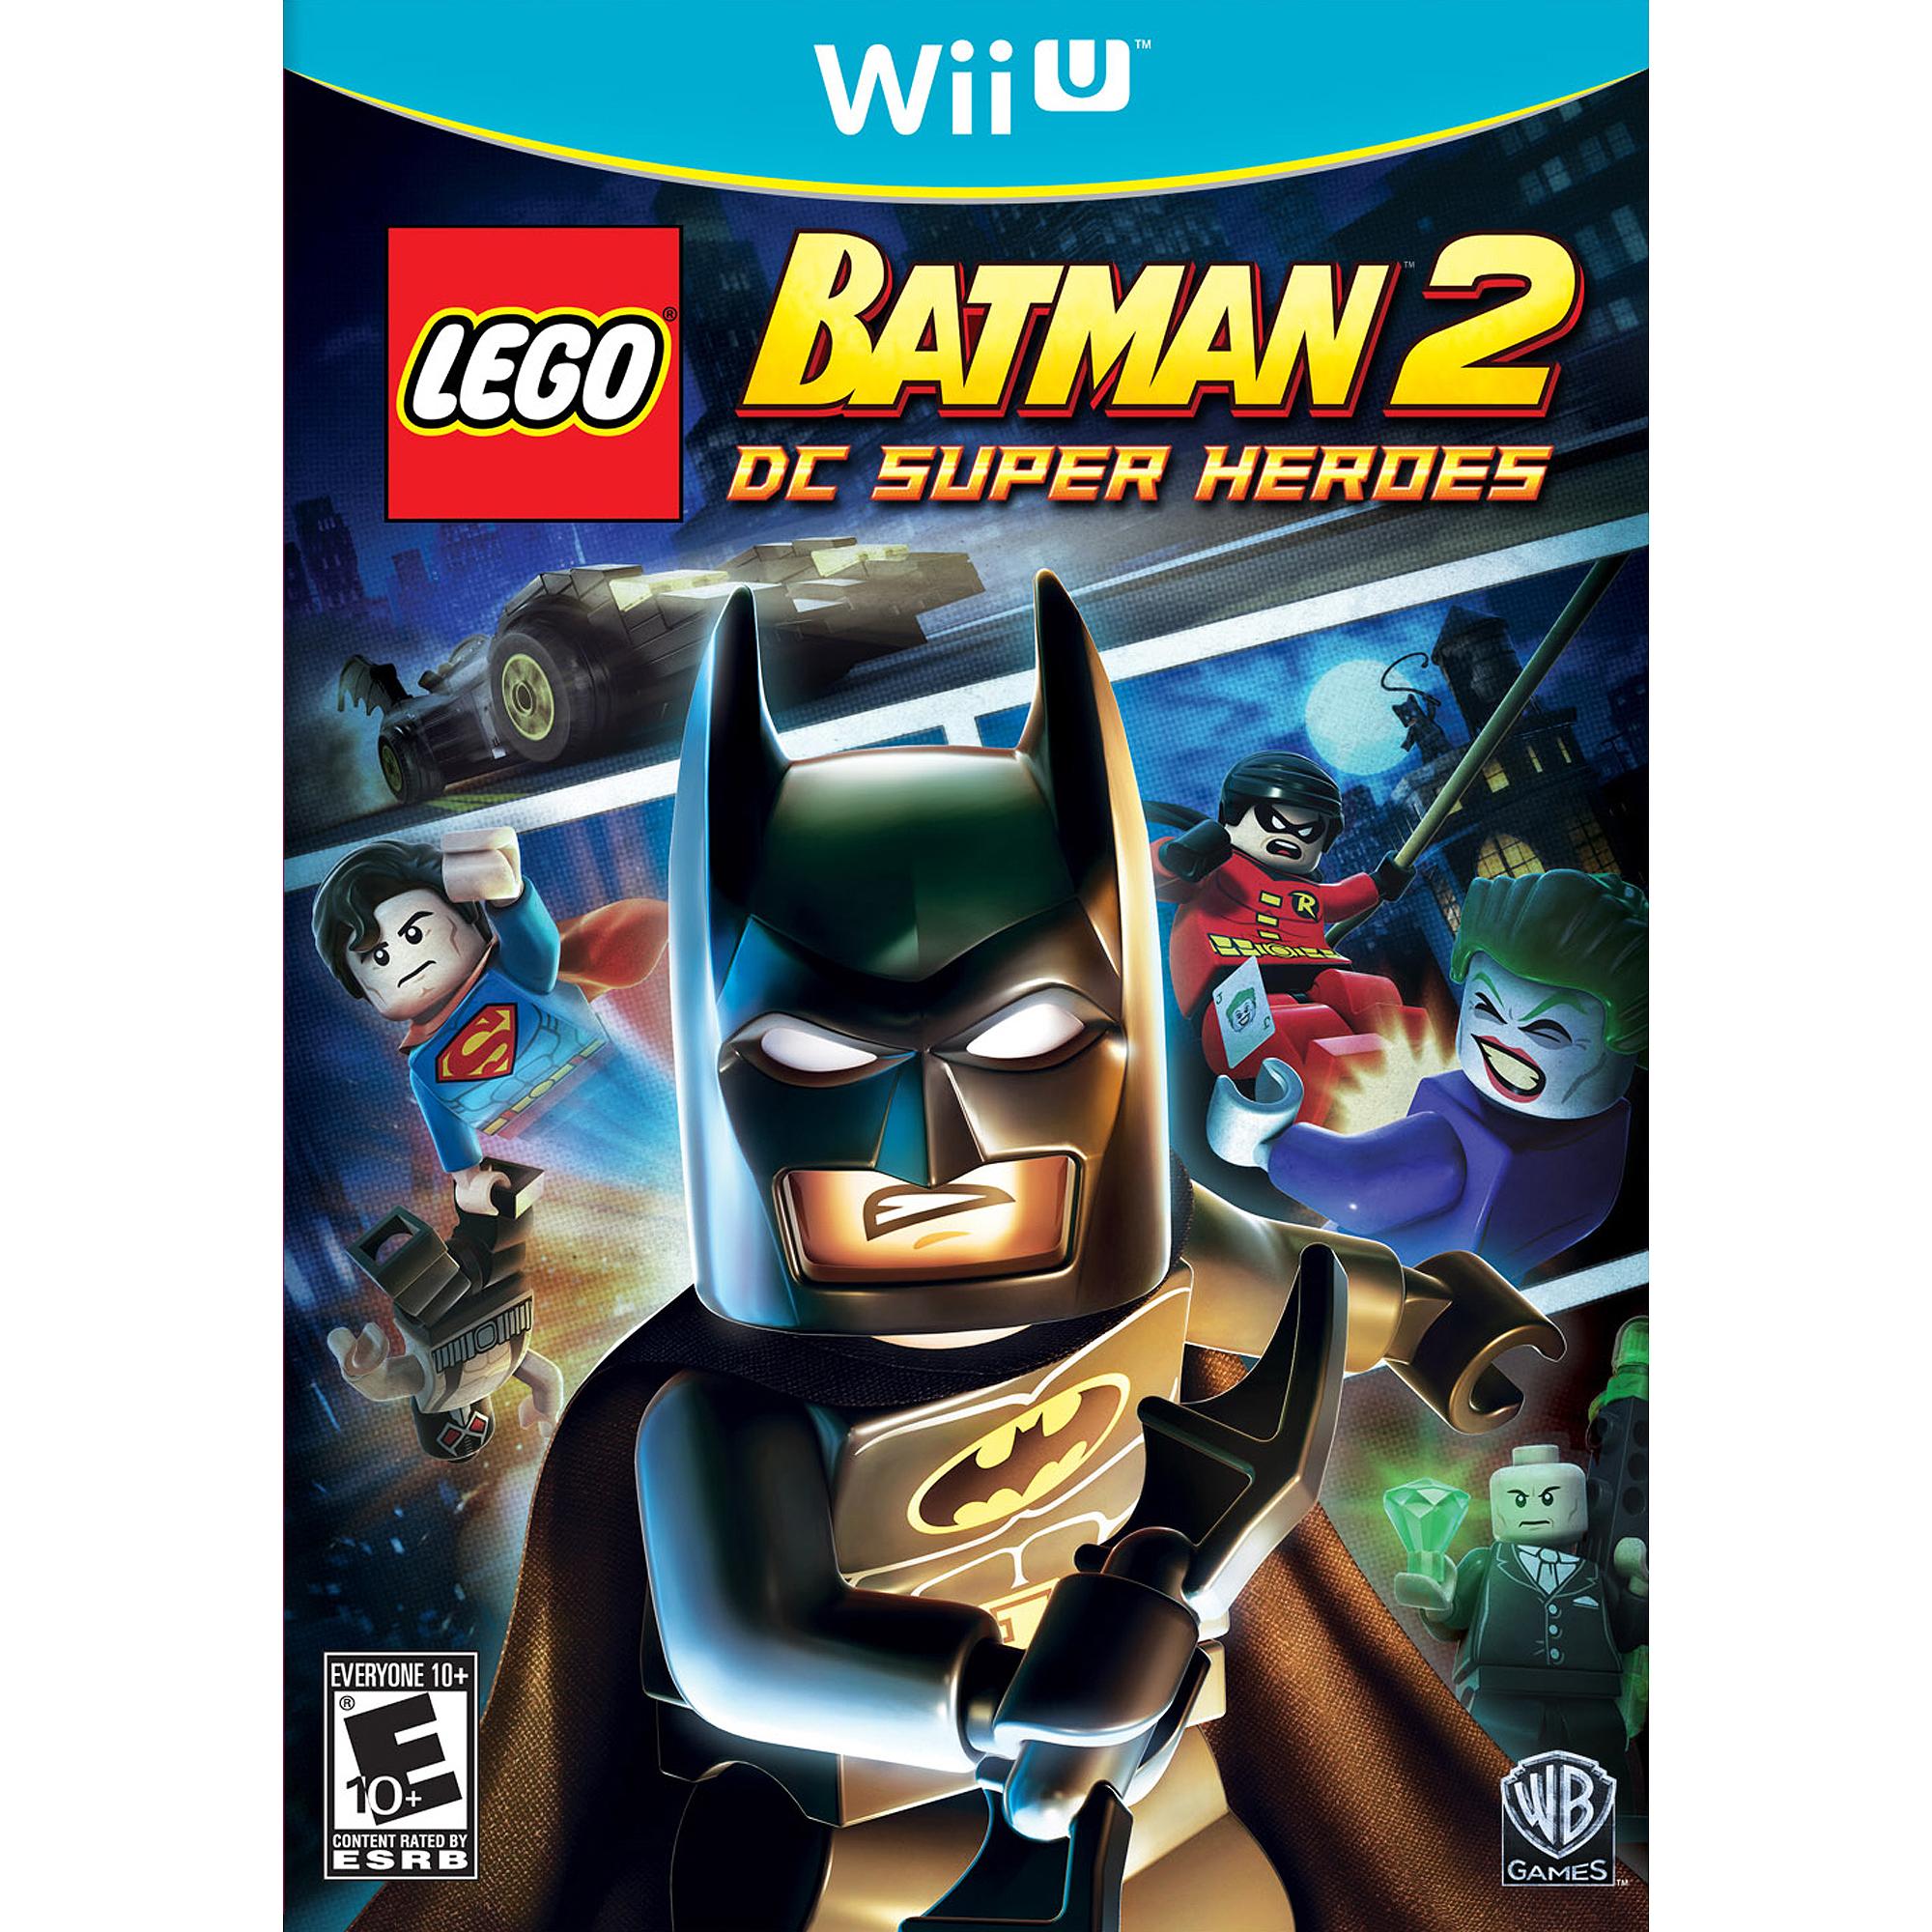 Lego Batman 2: DC Super Heroes (Wii U) - Pre-Owned